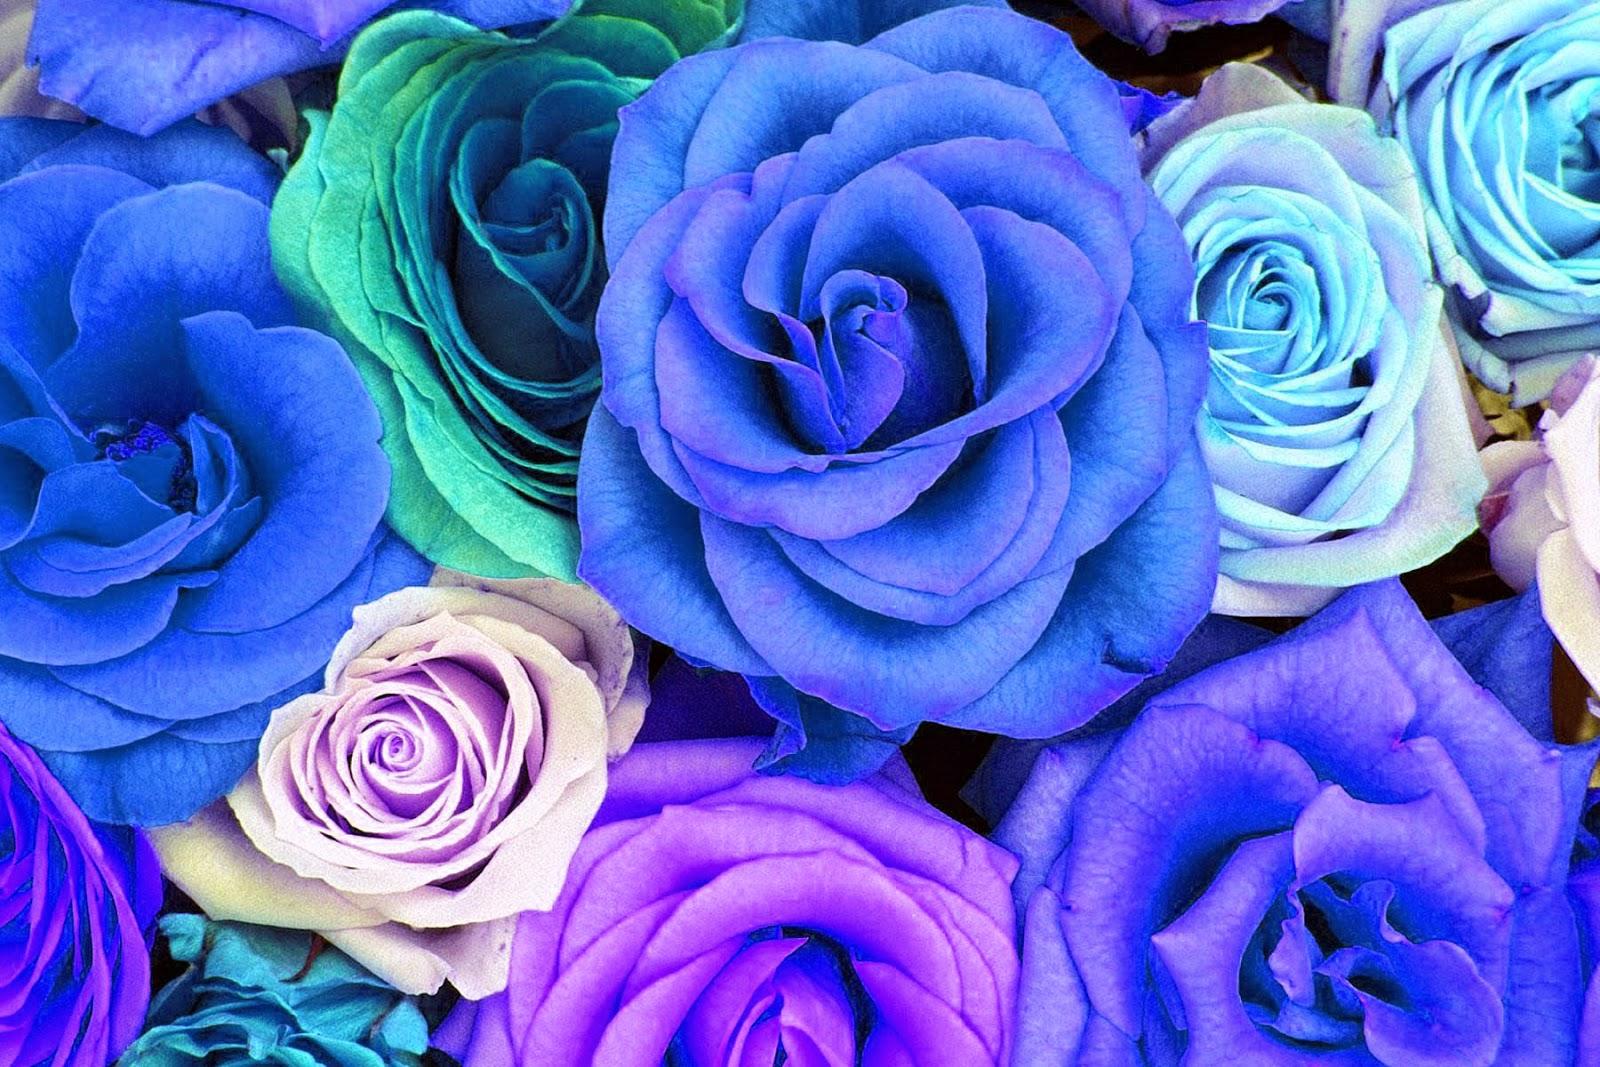 Doodlecraft: Watercolor Roses Wallpaper Freebies!